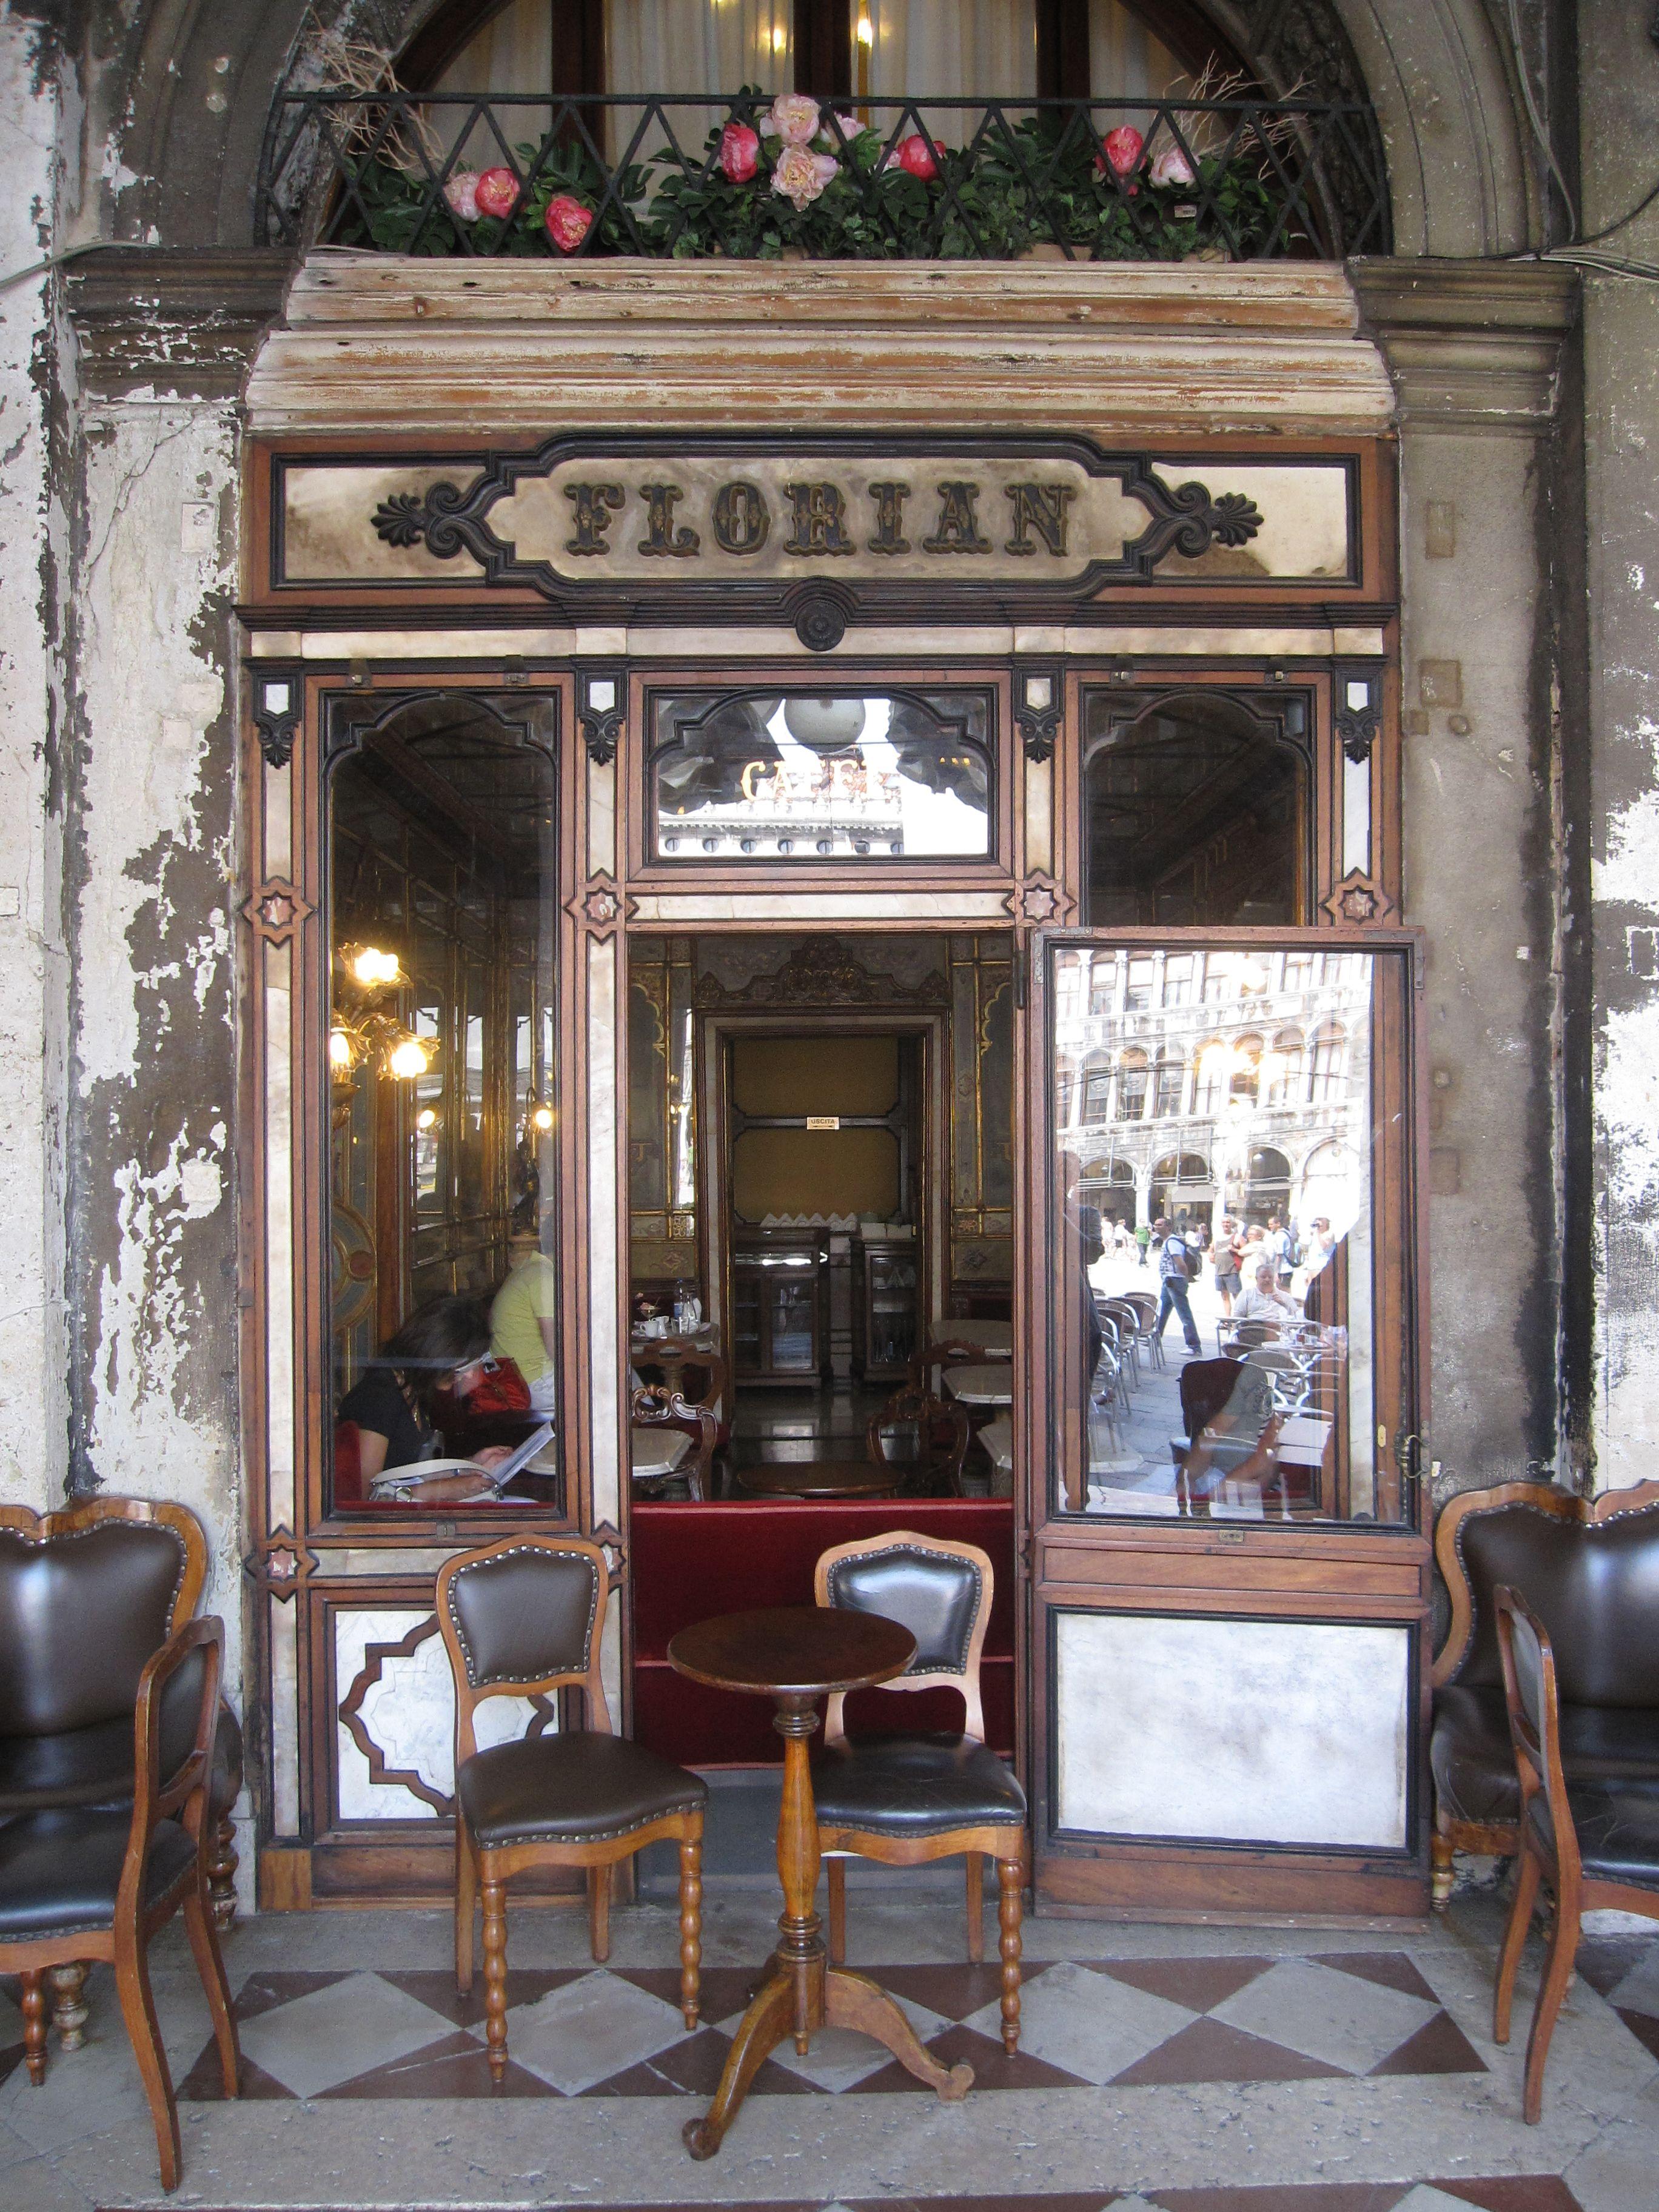 Venedig: Mein Lieblingscafé